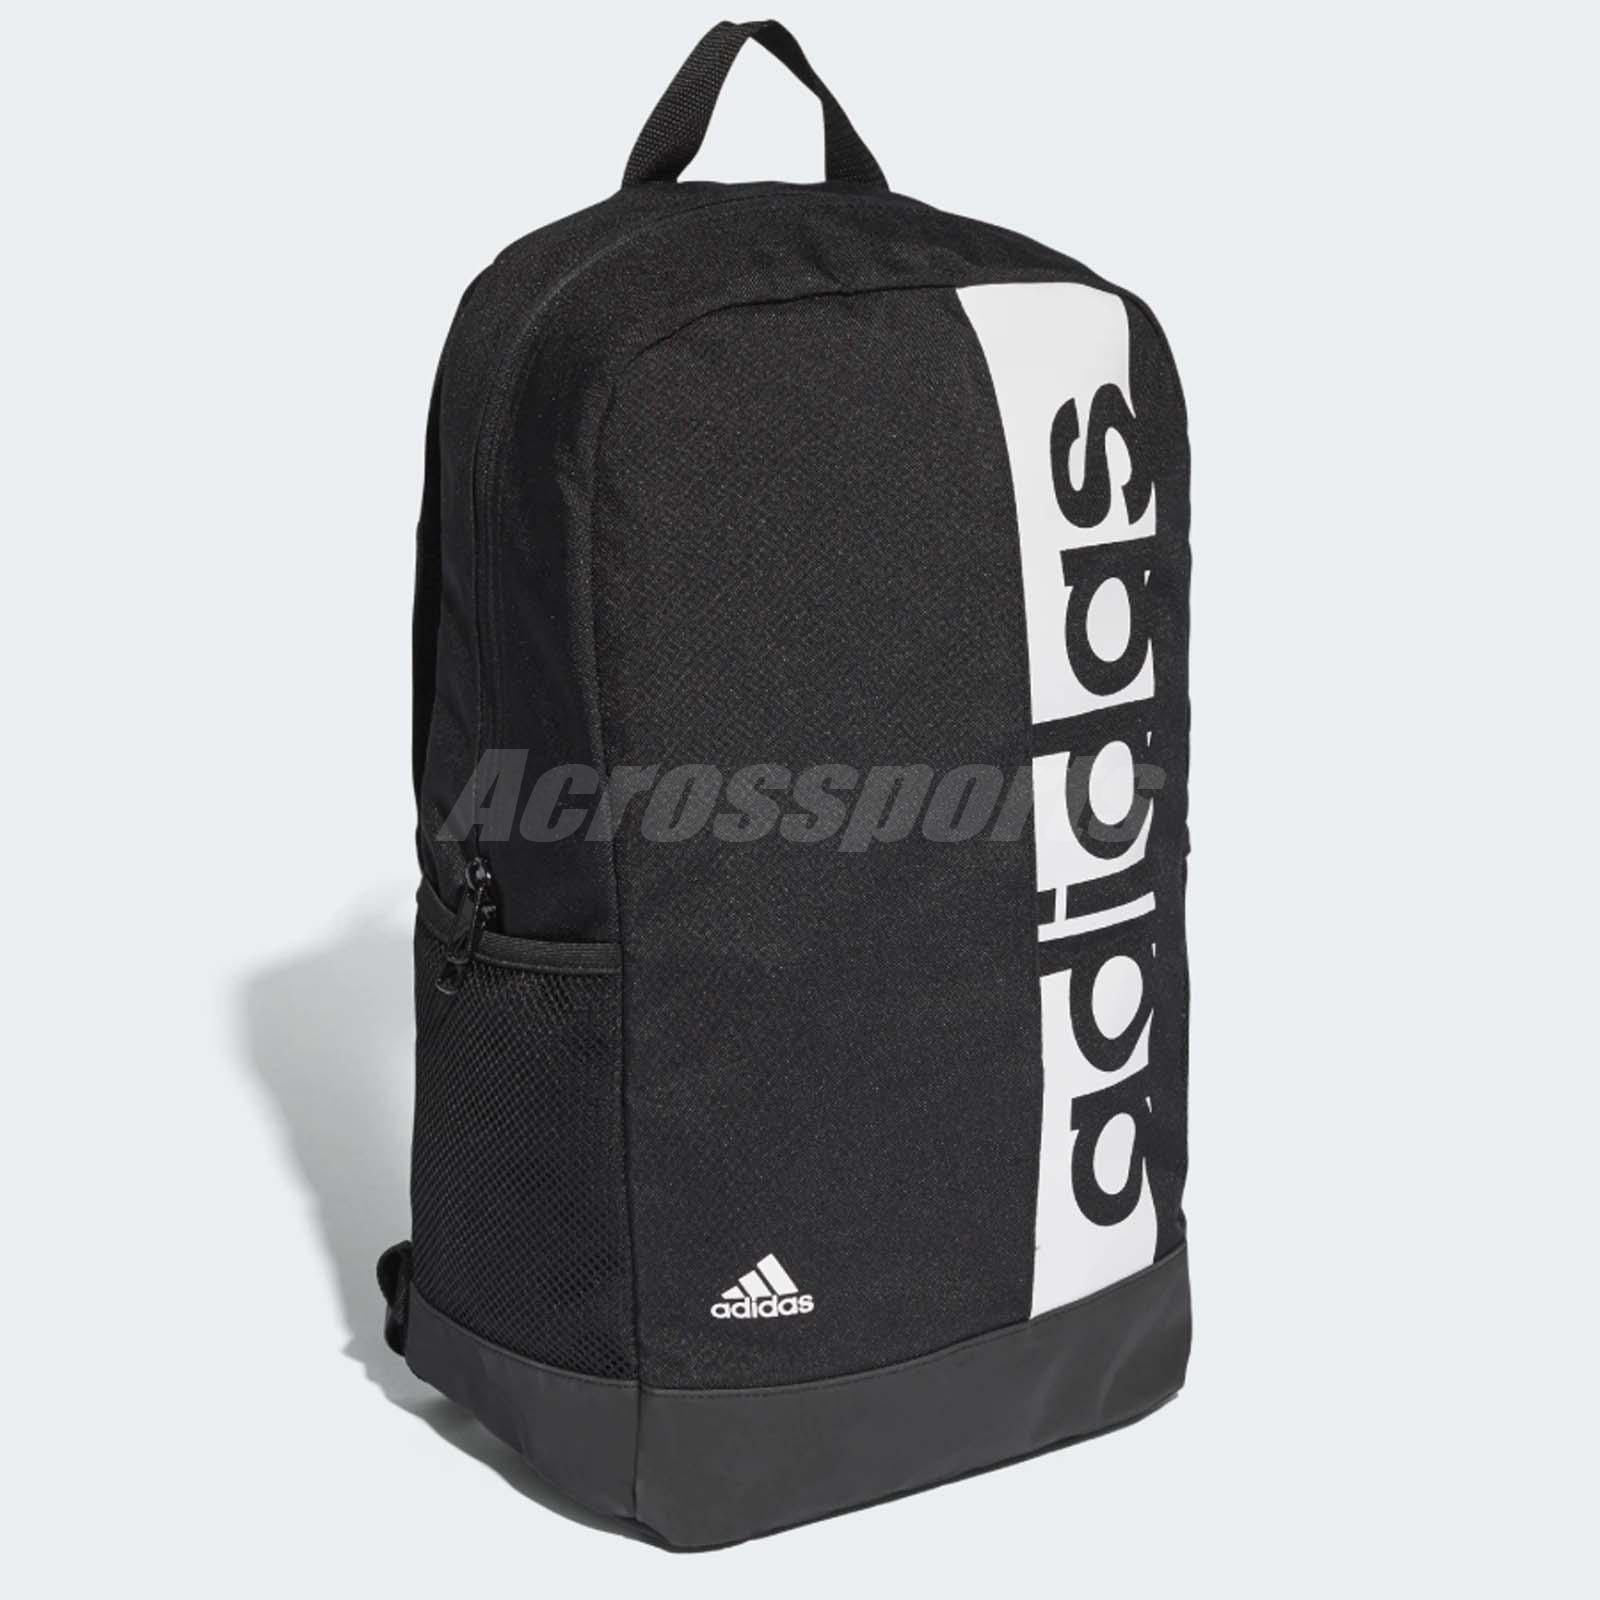 c99d05b75d adidas Linear Performance Backpack Training Workout Running Sport ...